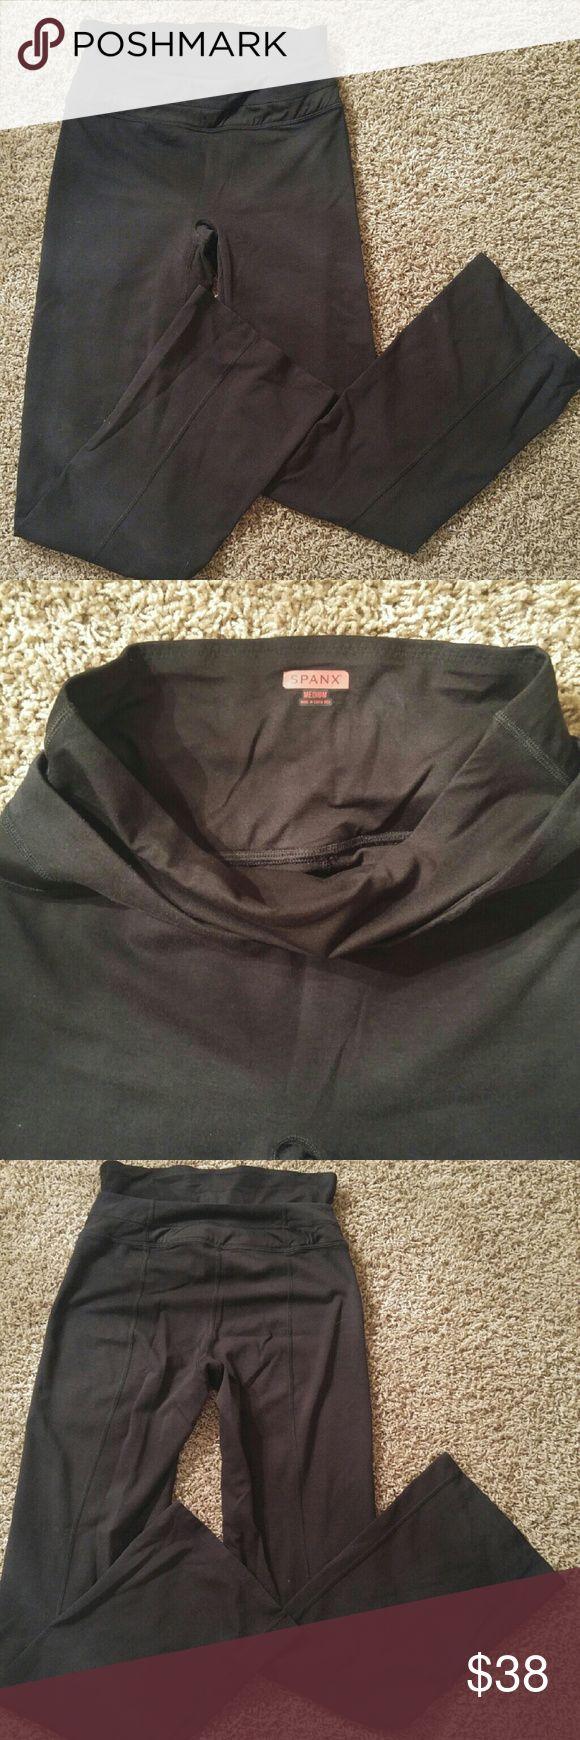 Spanx yoga pants Black pants Size medium SPANX Pants